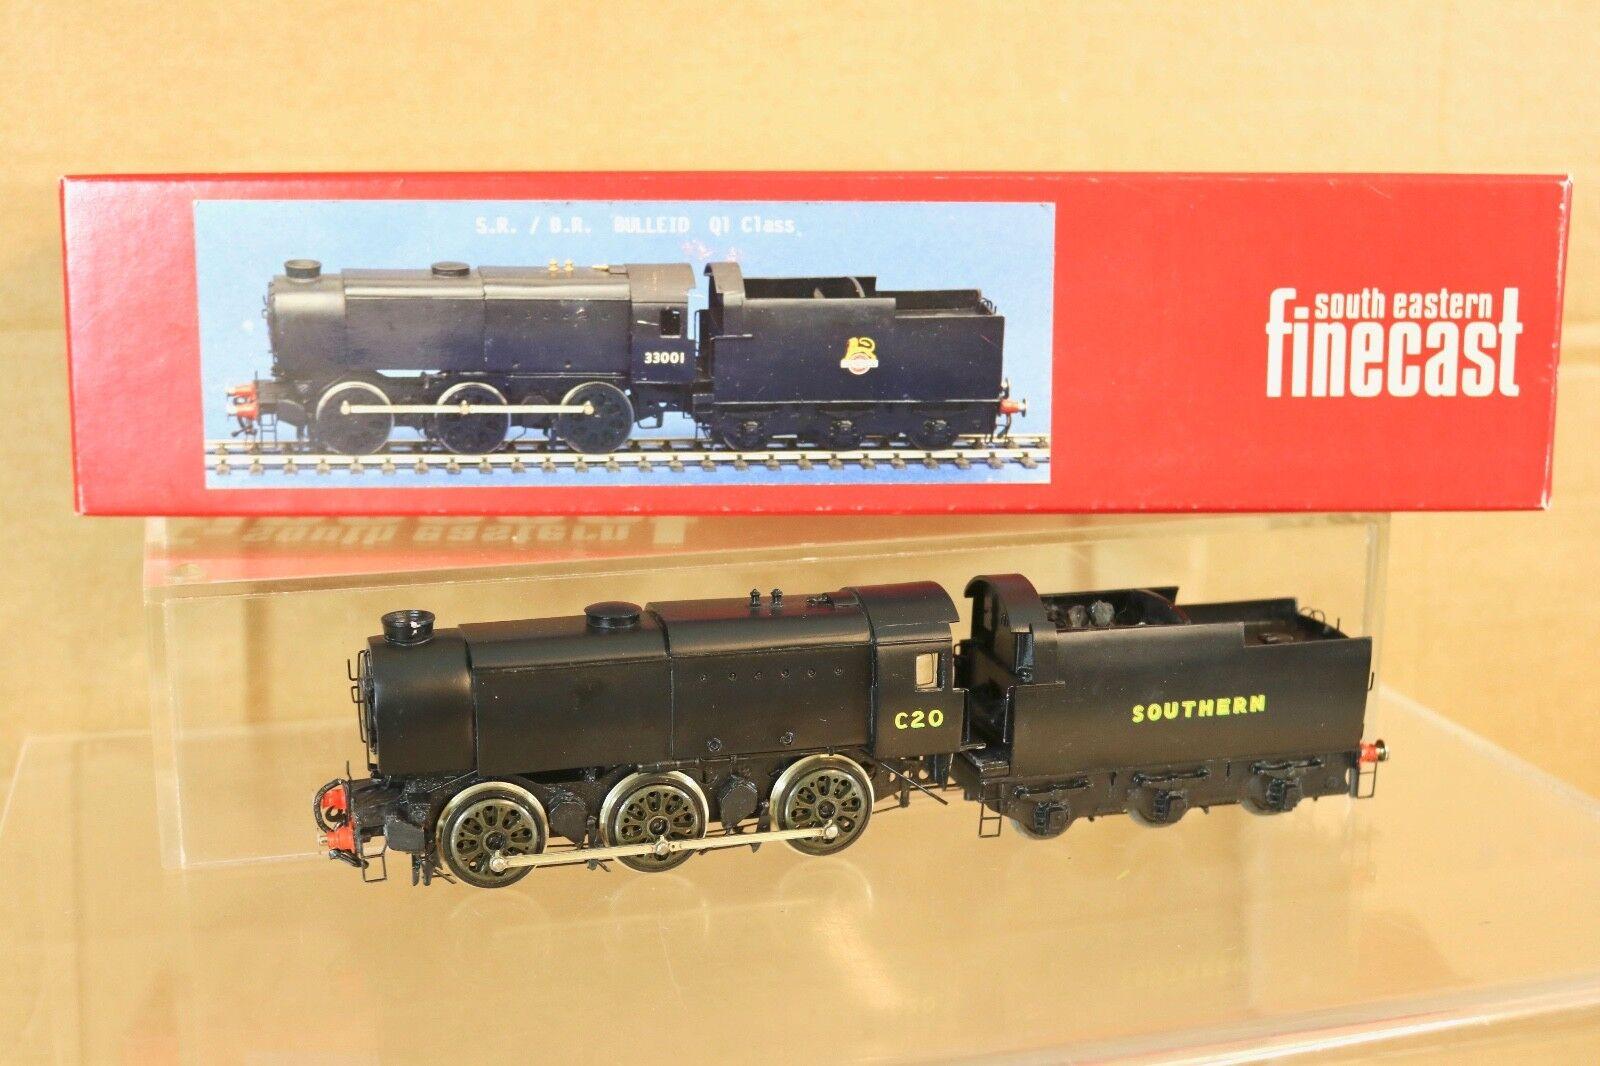 Süd Östlich Finecast Set Gebaut Southern Sr 0 6 0 Klasse Q1 Lokomotive C20